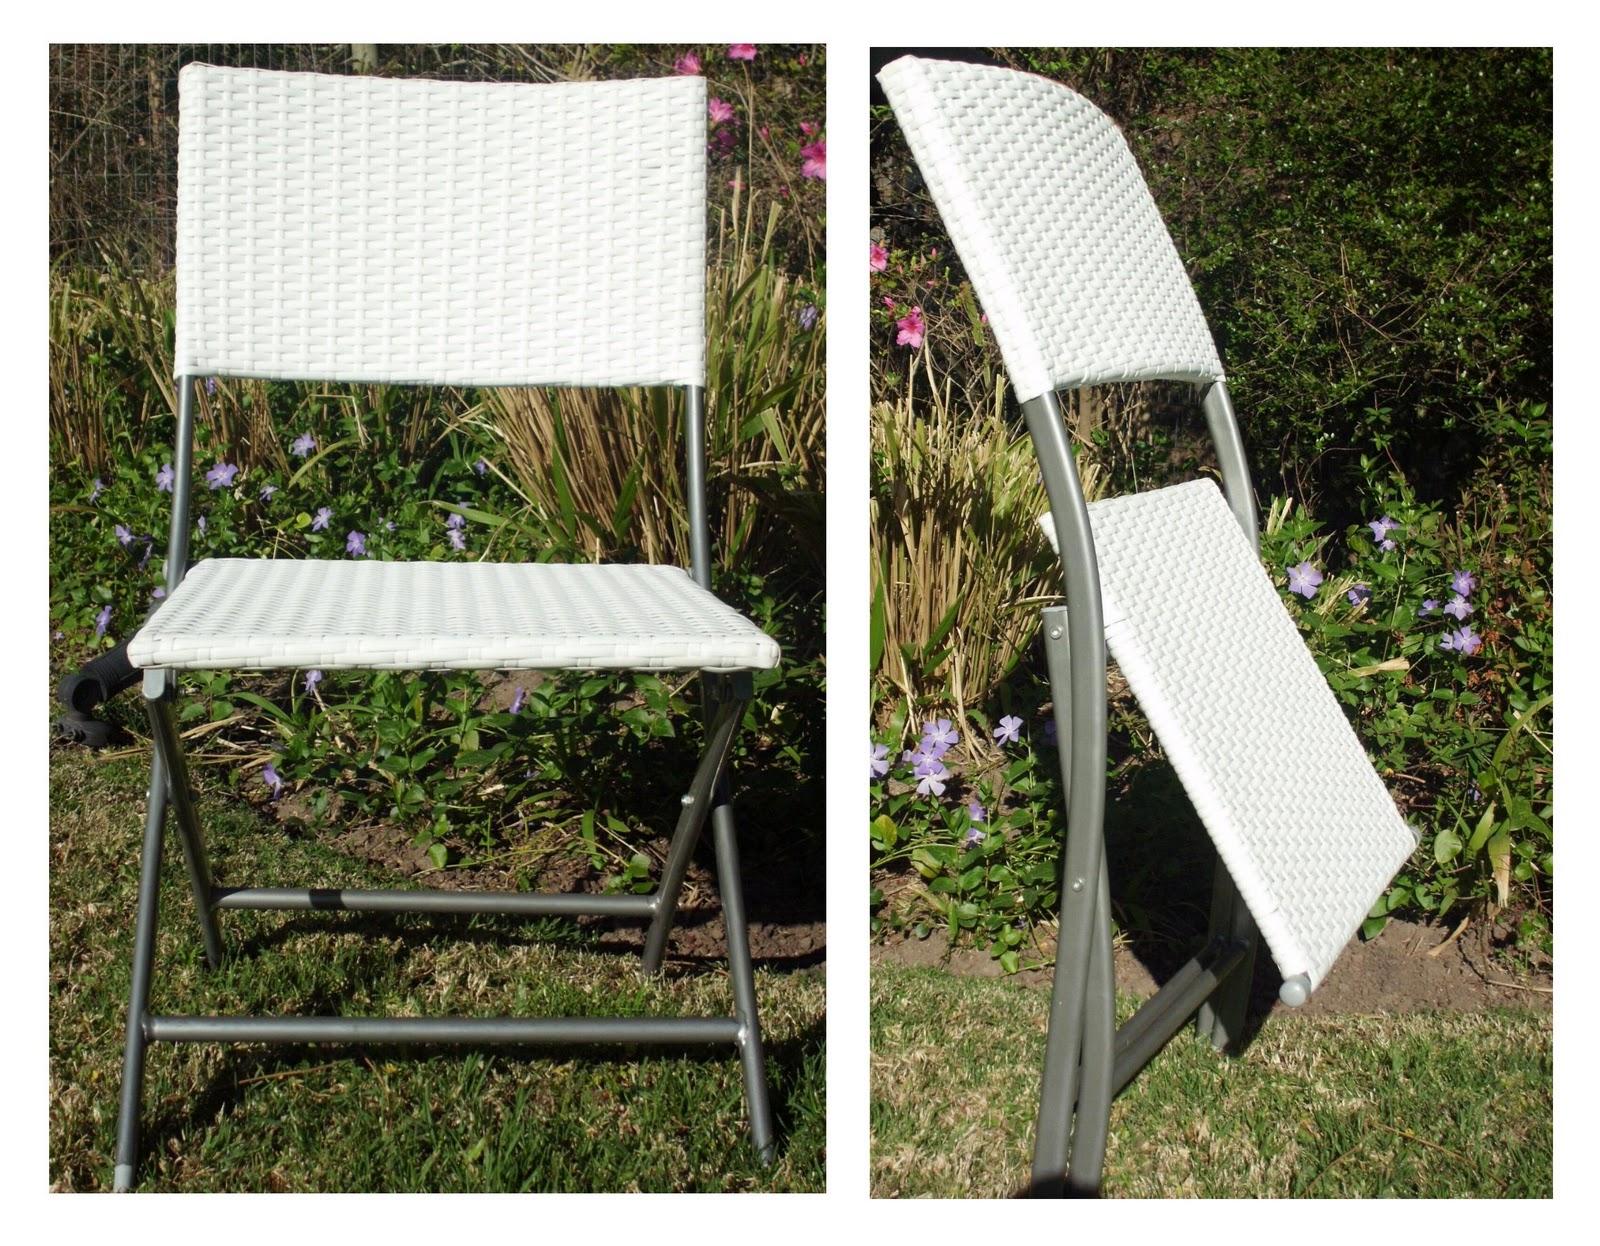 Lark jardin sillas de jardin en aluminio y rattan - Sillas de jardin de aluminio ...